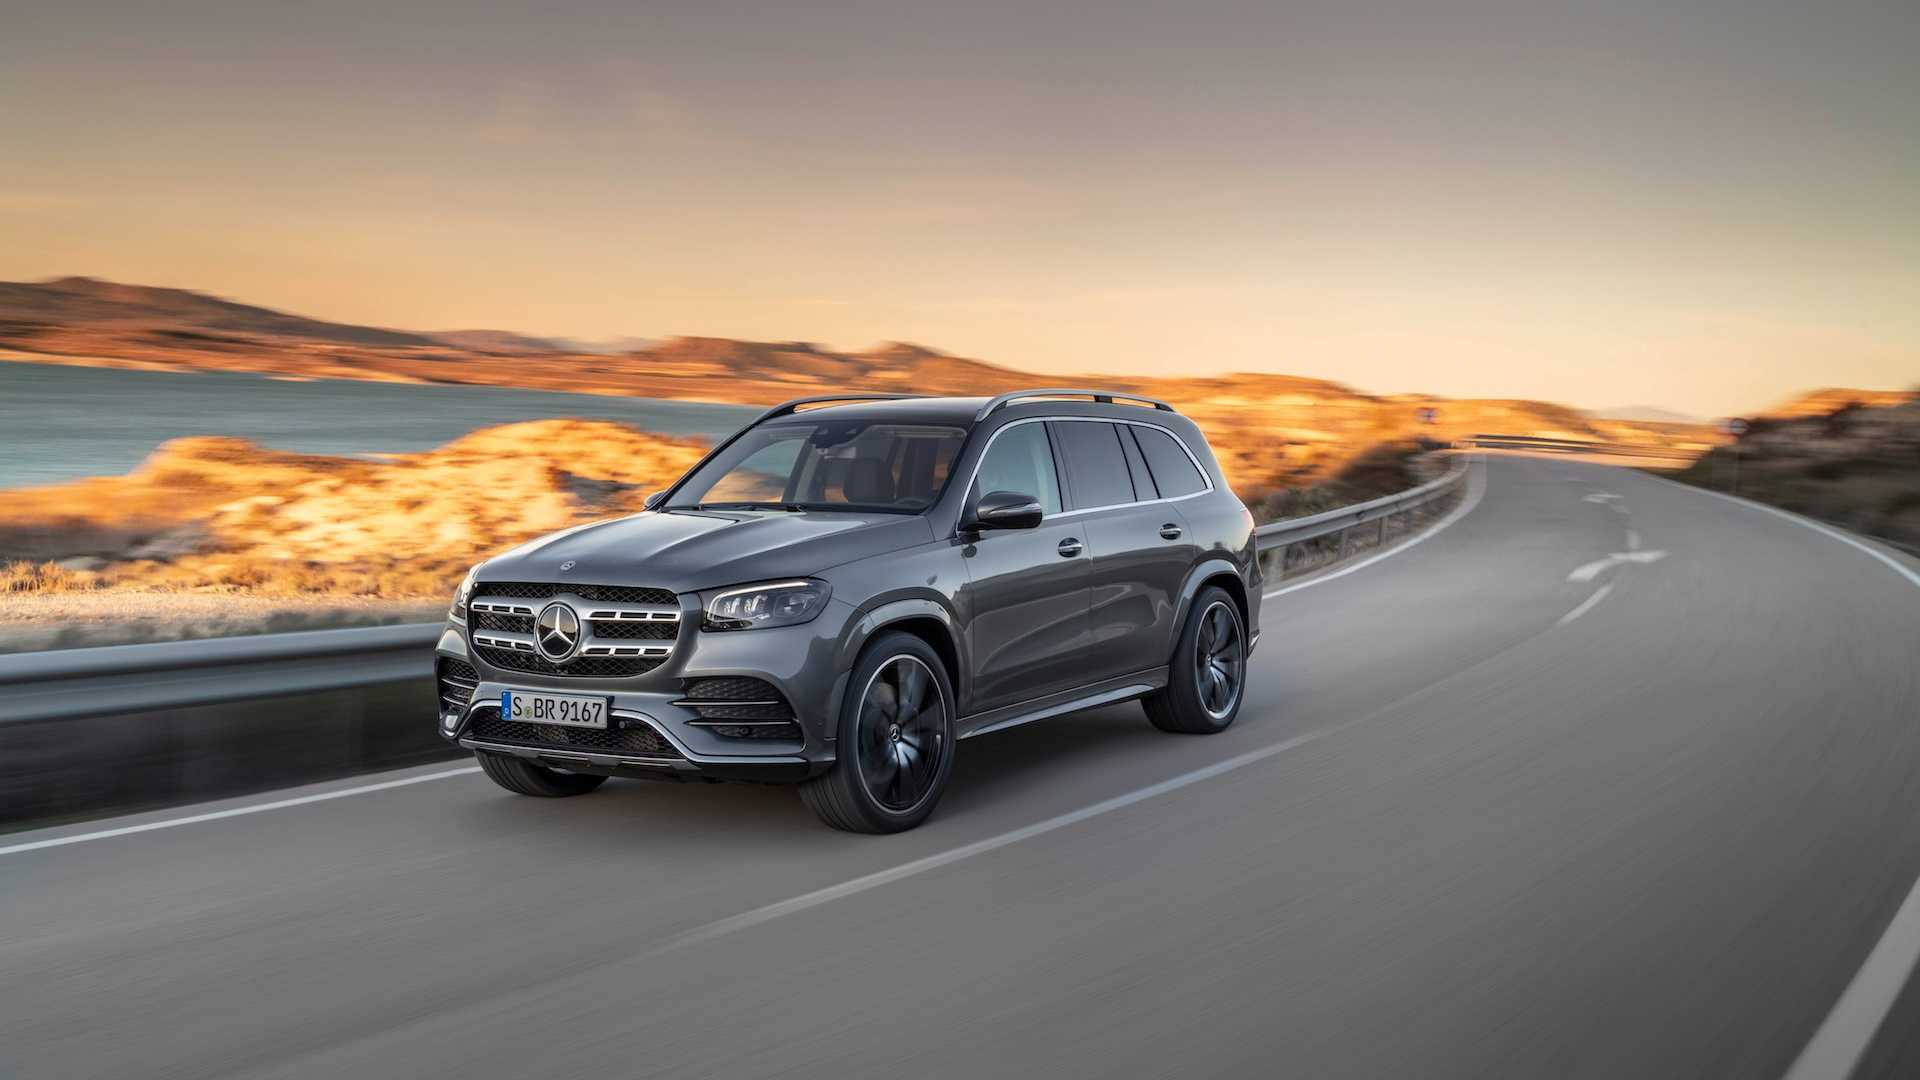 2020 Mercedes-Benz GLS AMG Line (Color: Designo Selenite Grey Metallic) Front Three-Quarter Wallpapers (4)